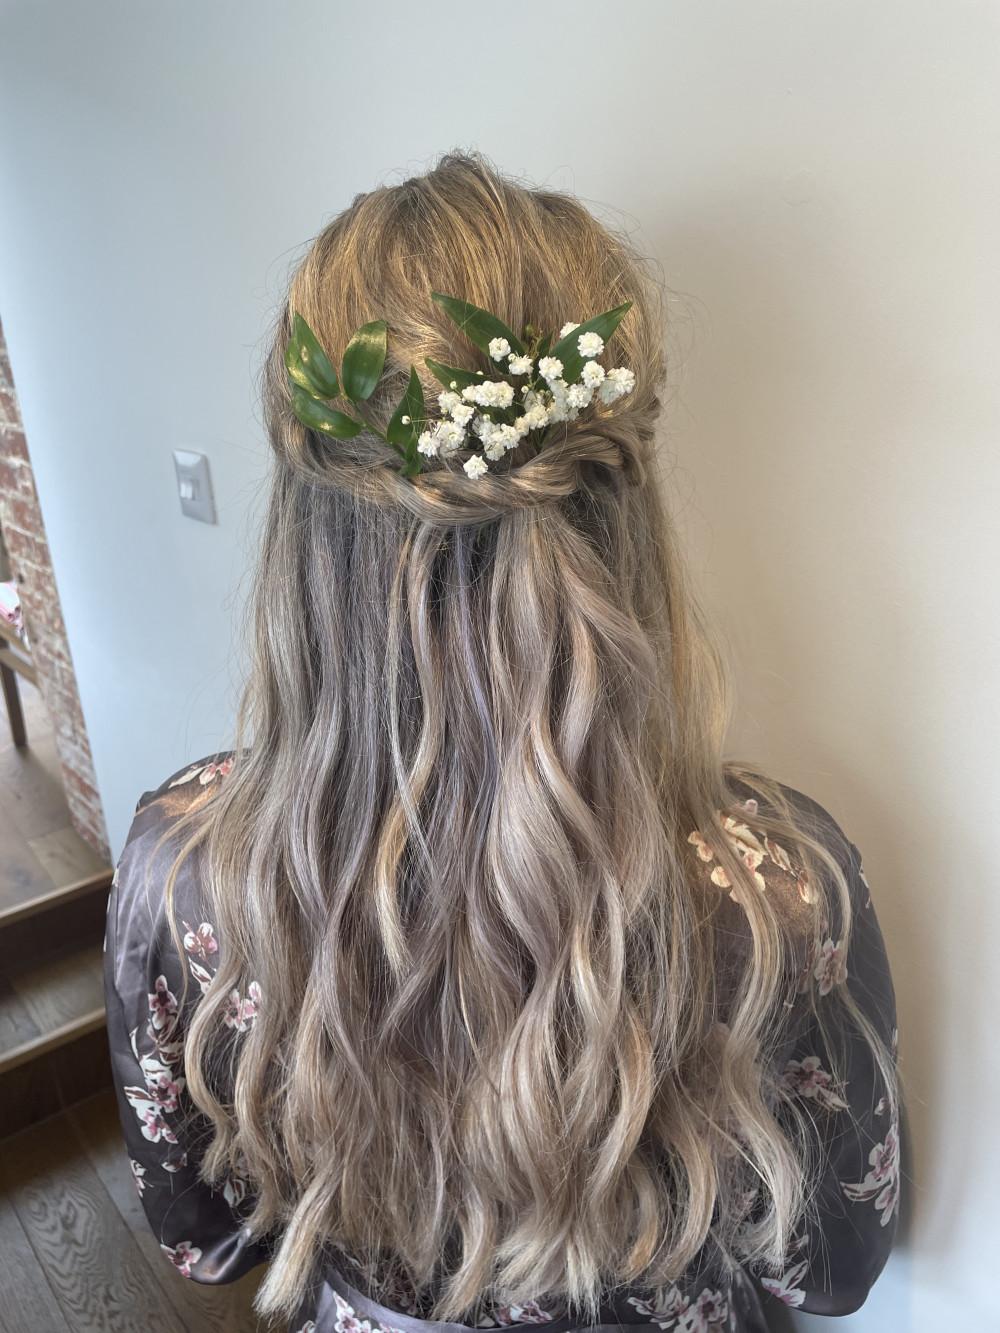 - Make Me Bridal Artist: Glow-Occasion Hair Specialists. #classic #boho #curls #gypsophila #bridalhair #flowersinherhair #pretty